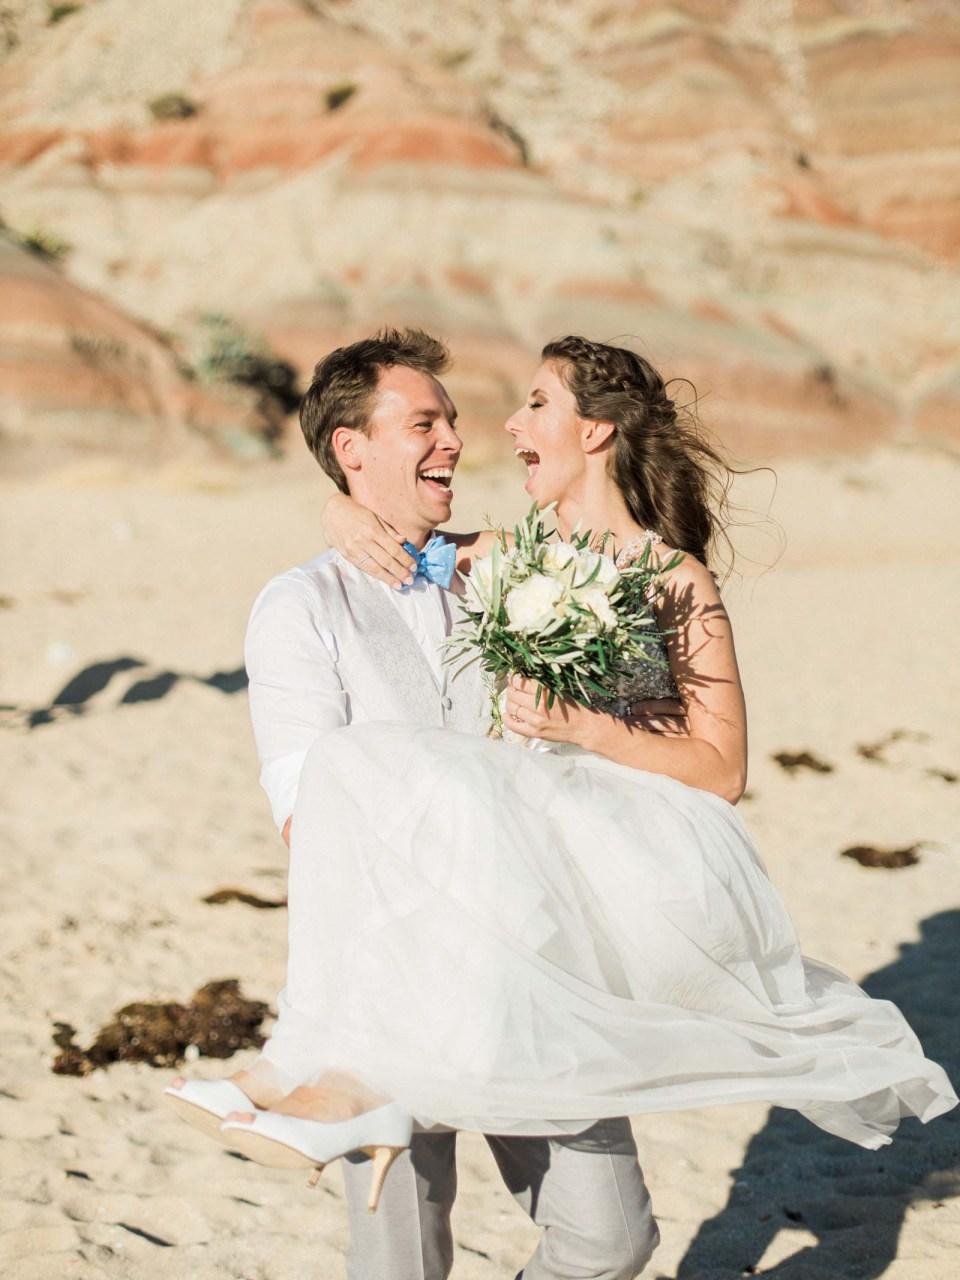 Algarve Elopement   Praia da Luz, Portugal   Married Morenos